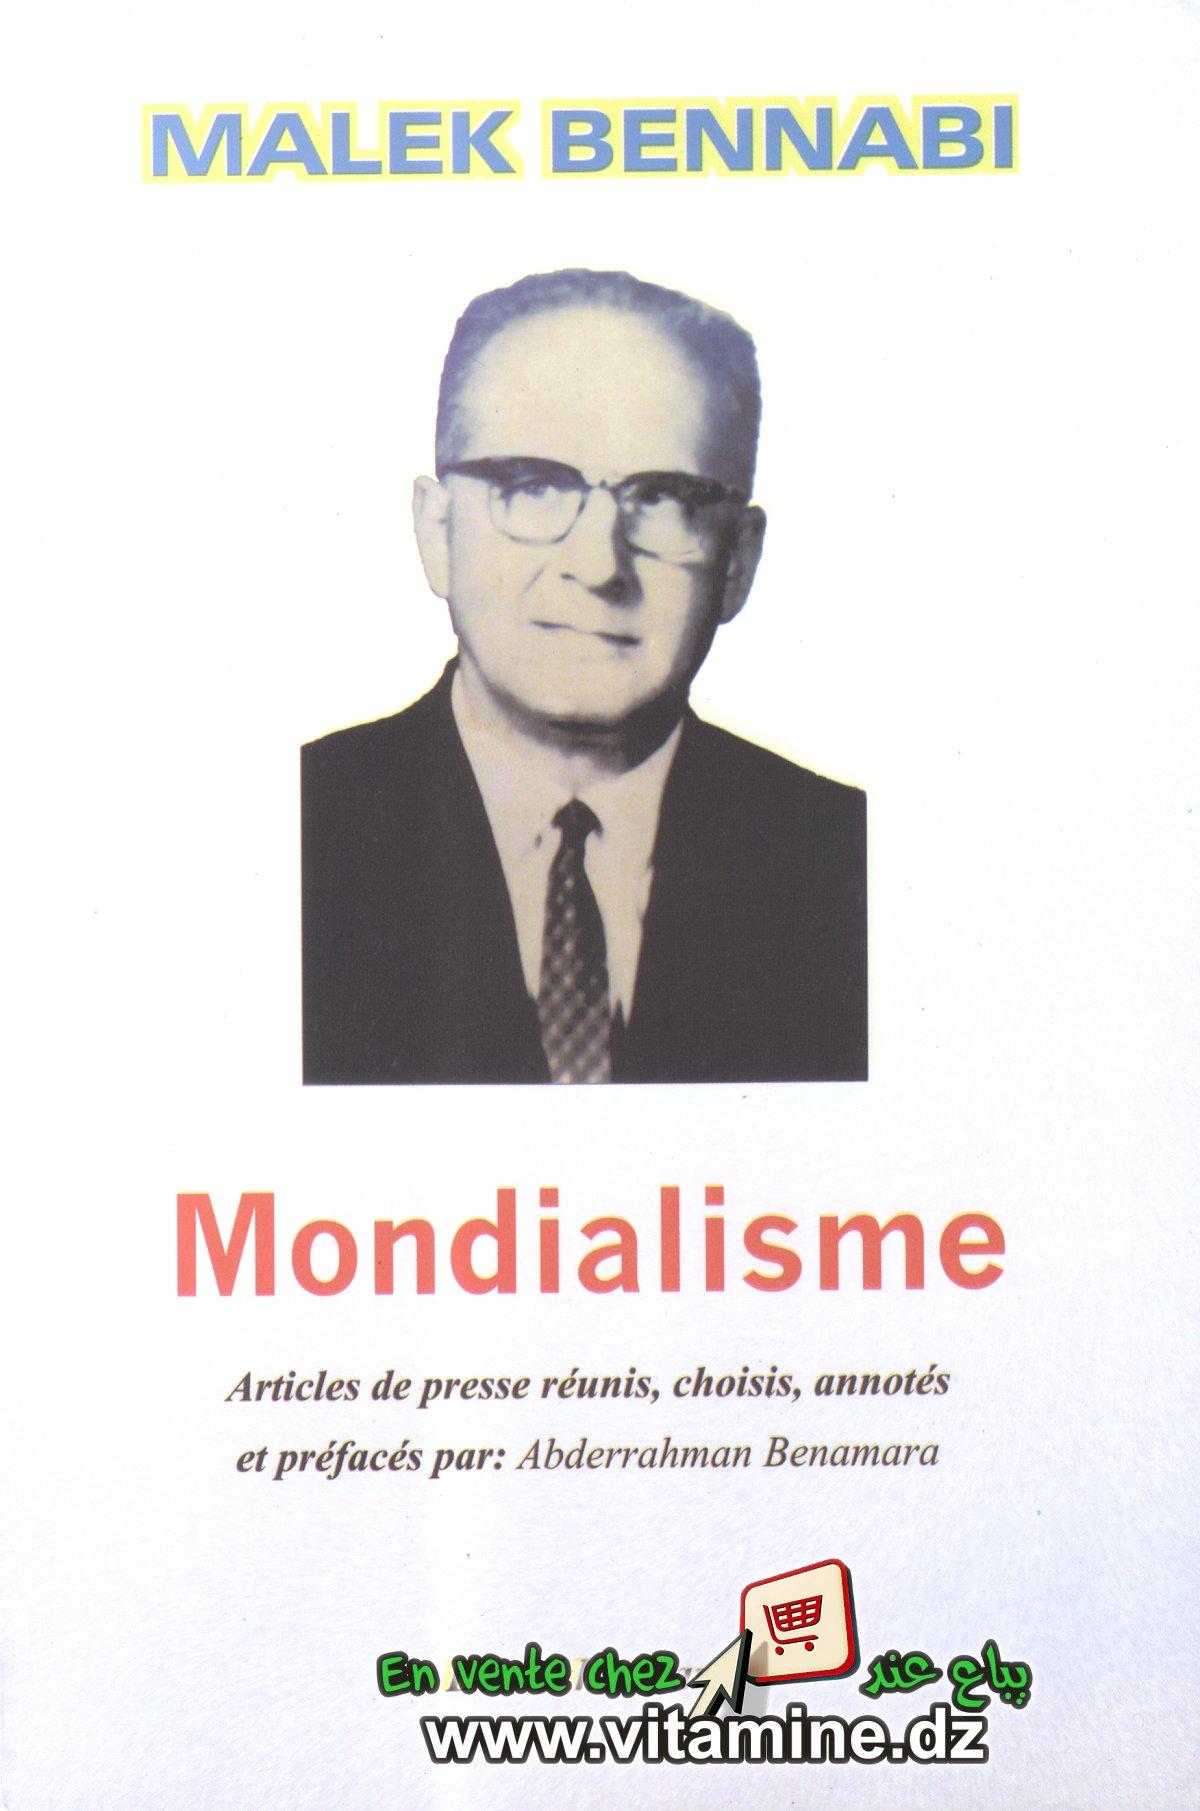 Malek Bennabi - Mondialisme